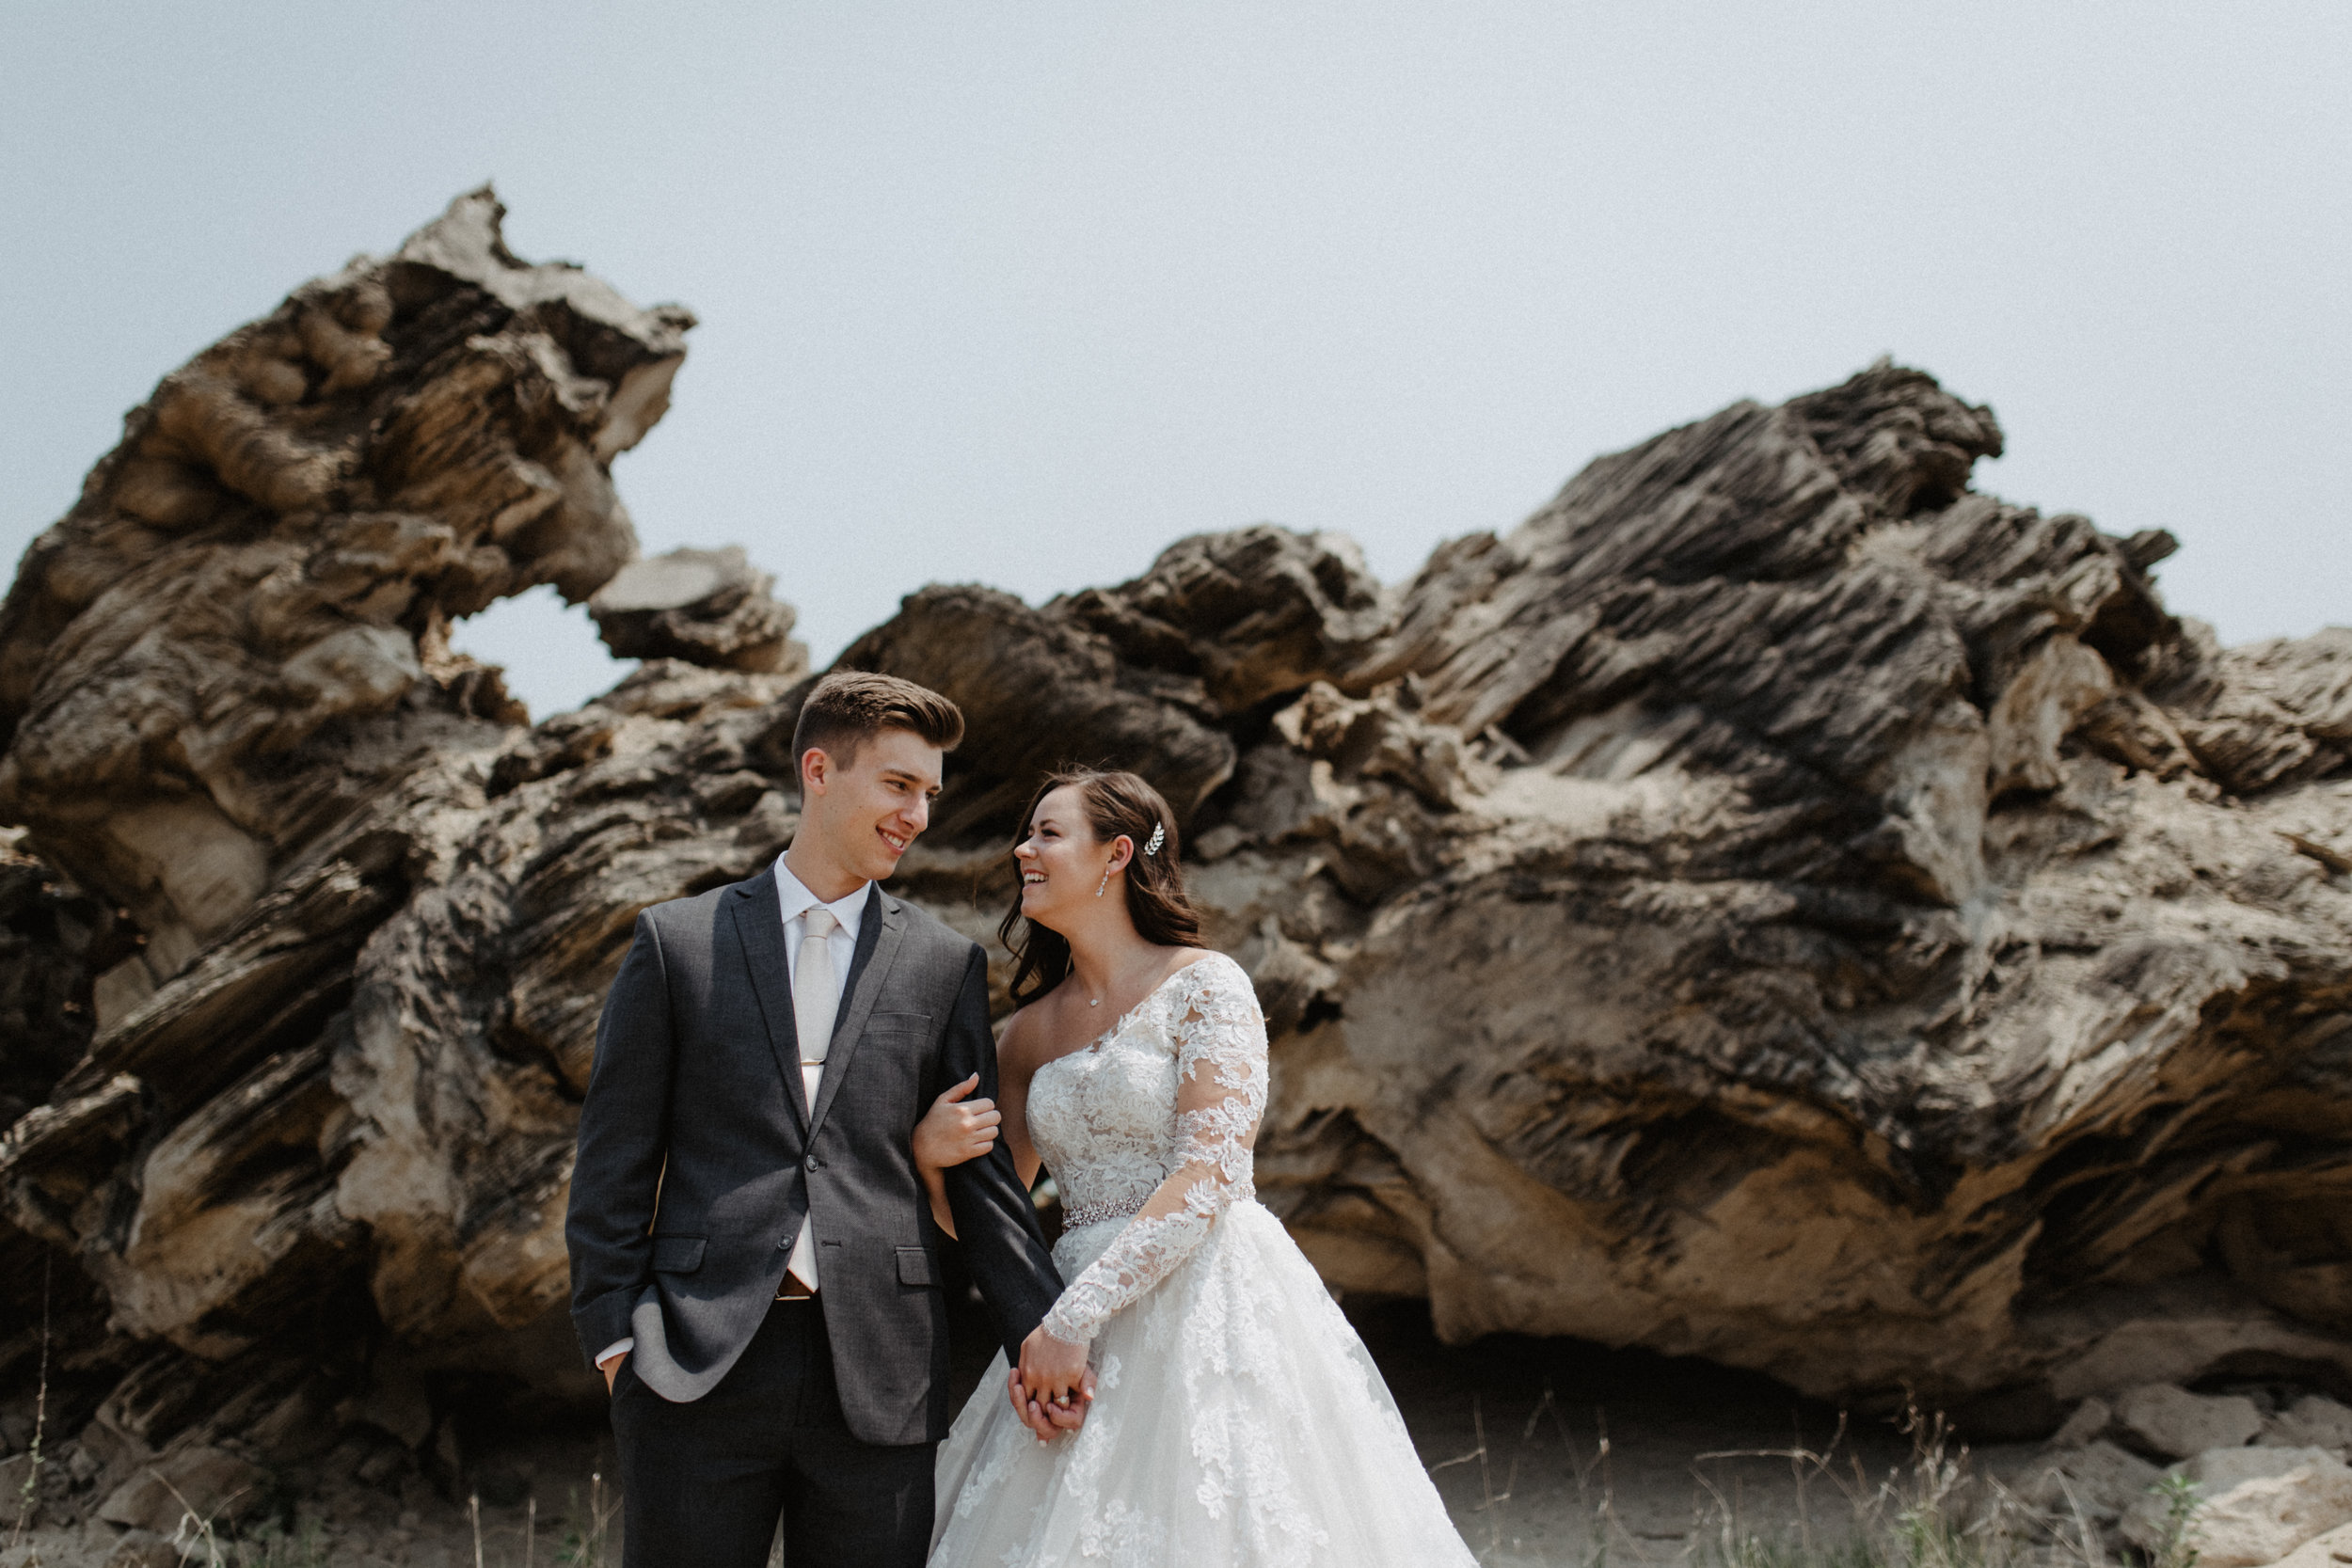 GRAYCENTOMHAMILTON-GRAND-RAPIDS-WEDDING-PHOTOGRAPHY-22.jpg